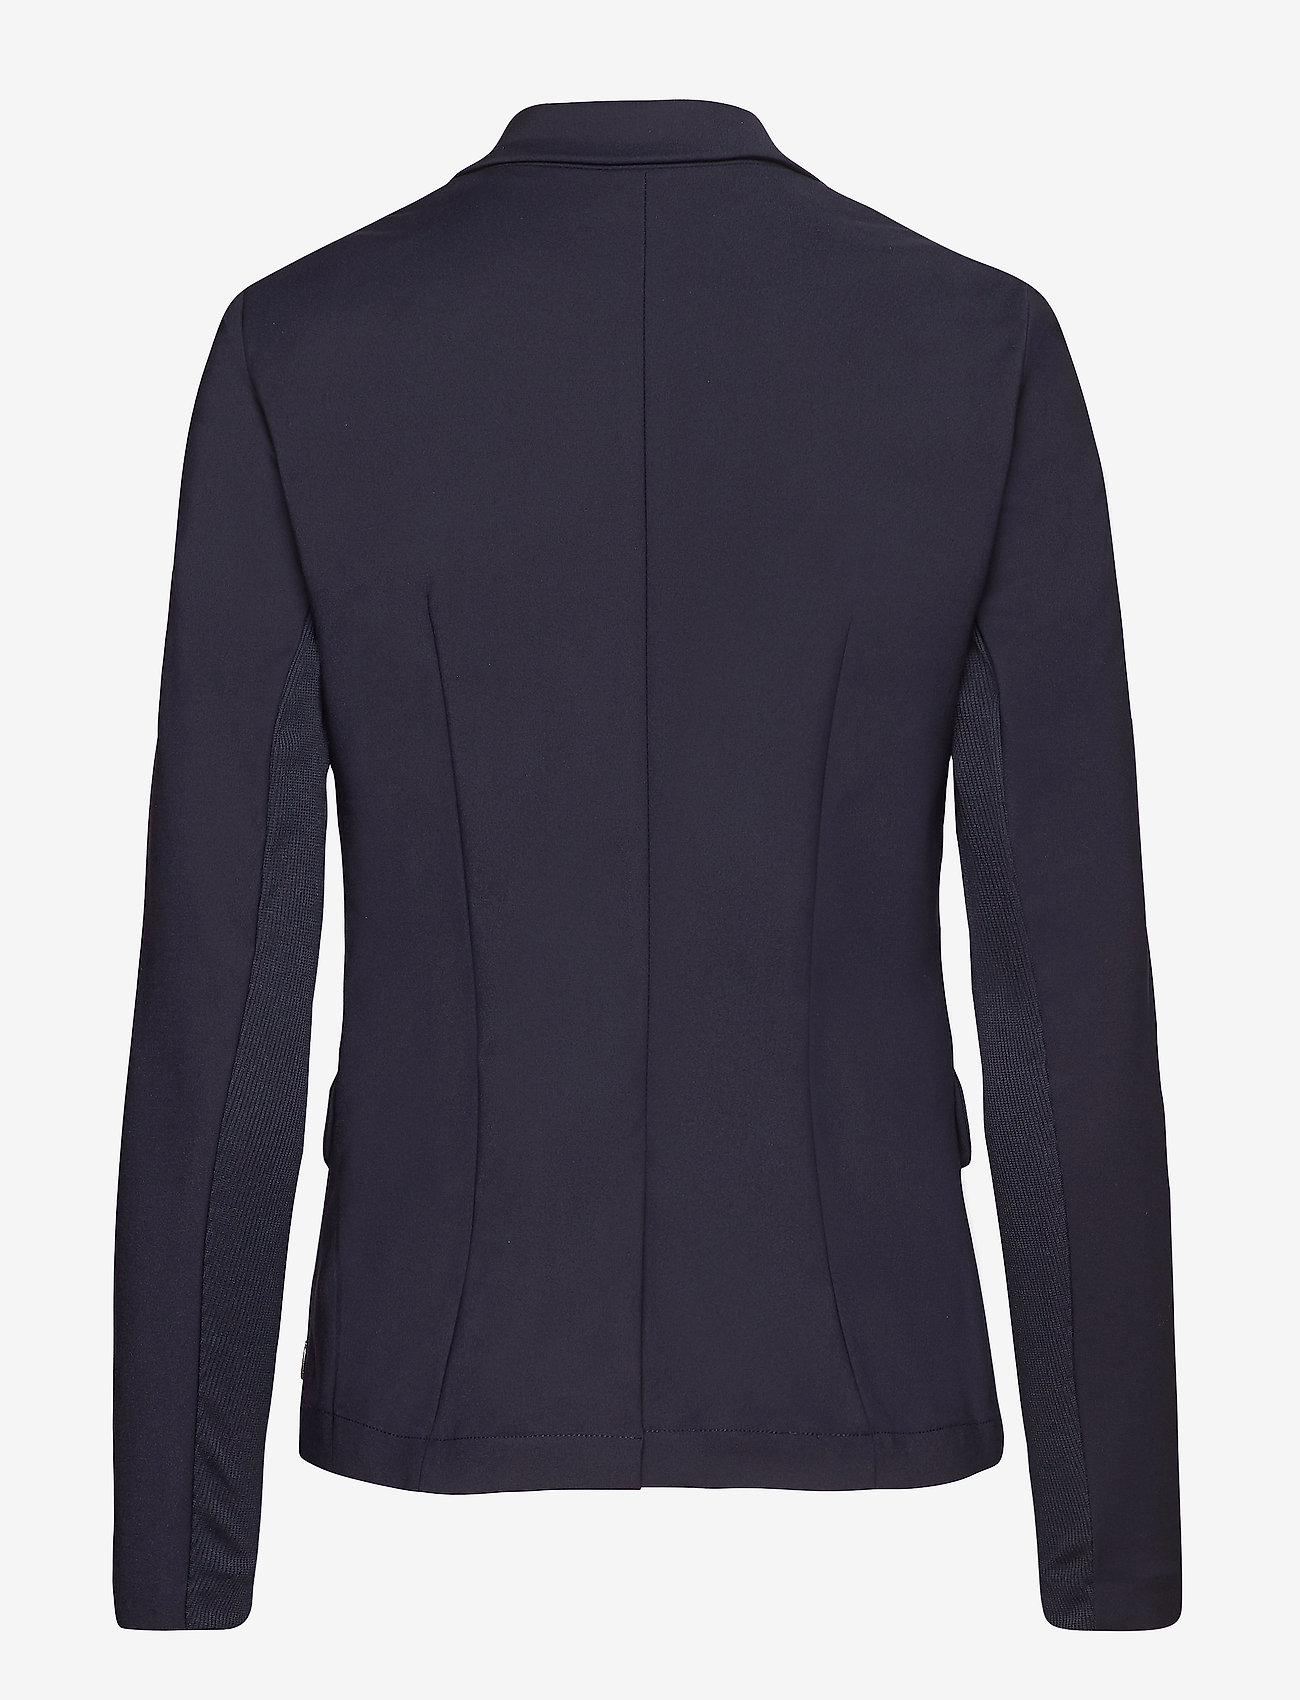 Coster Copenhagen - Suit jacket - vardagskavajer - night sky blue - 1